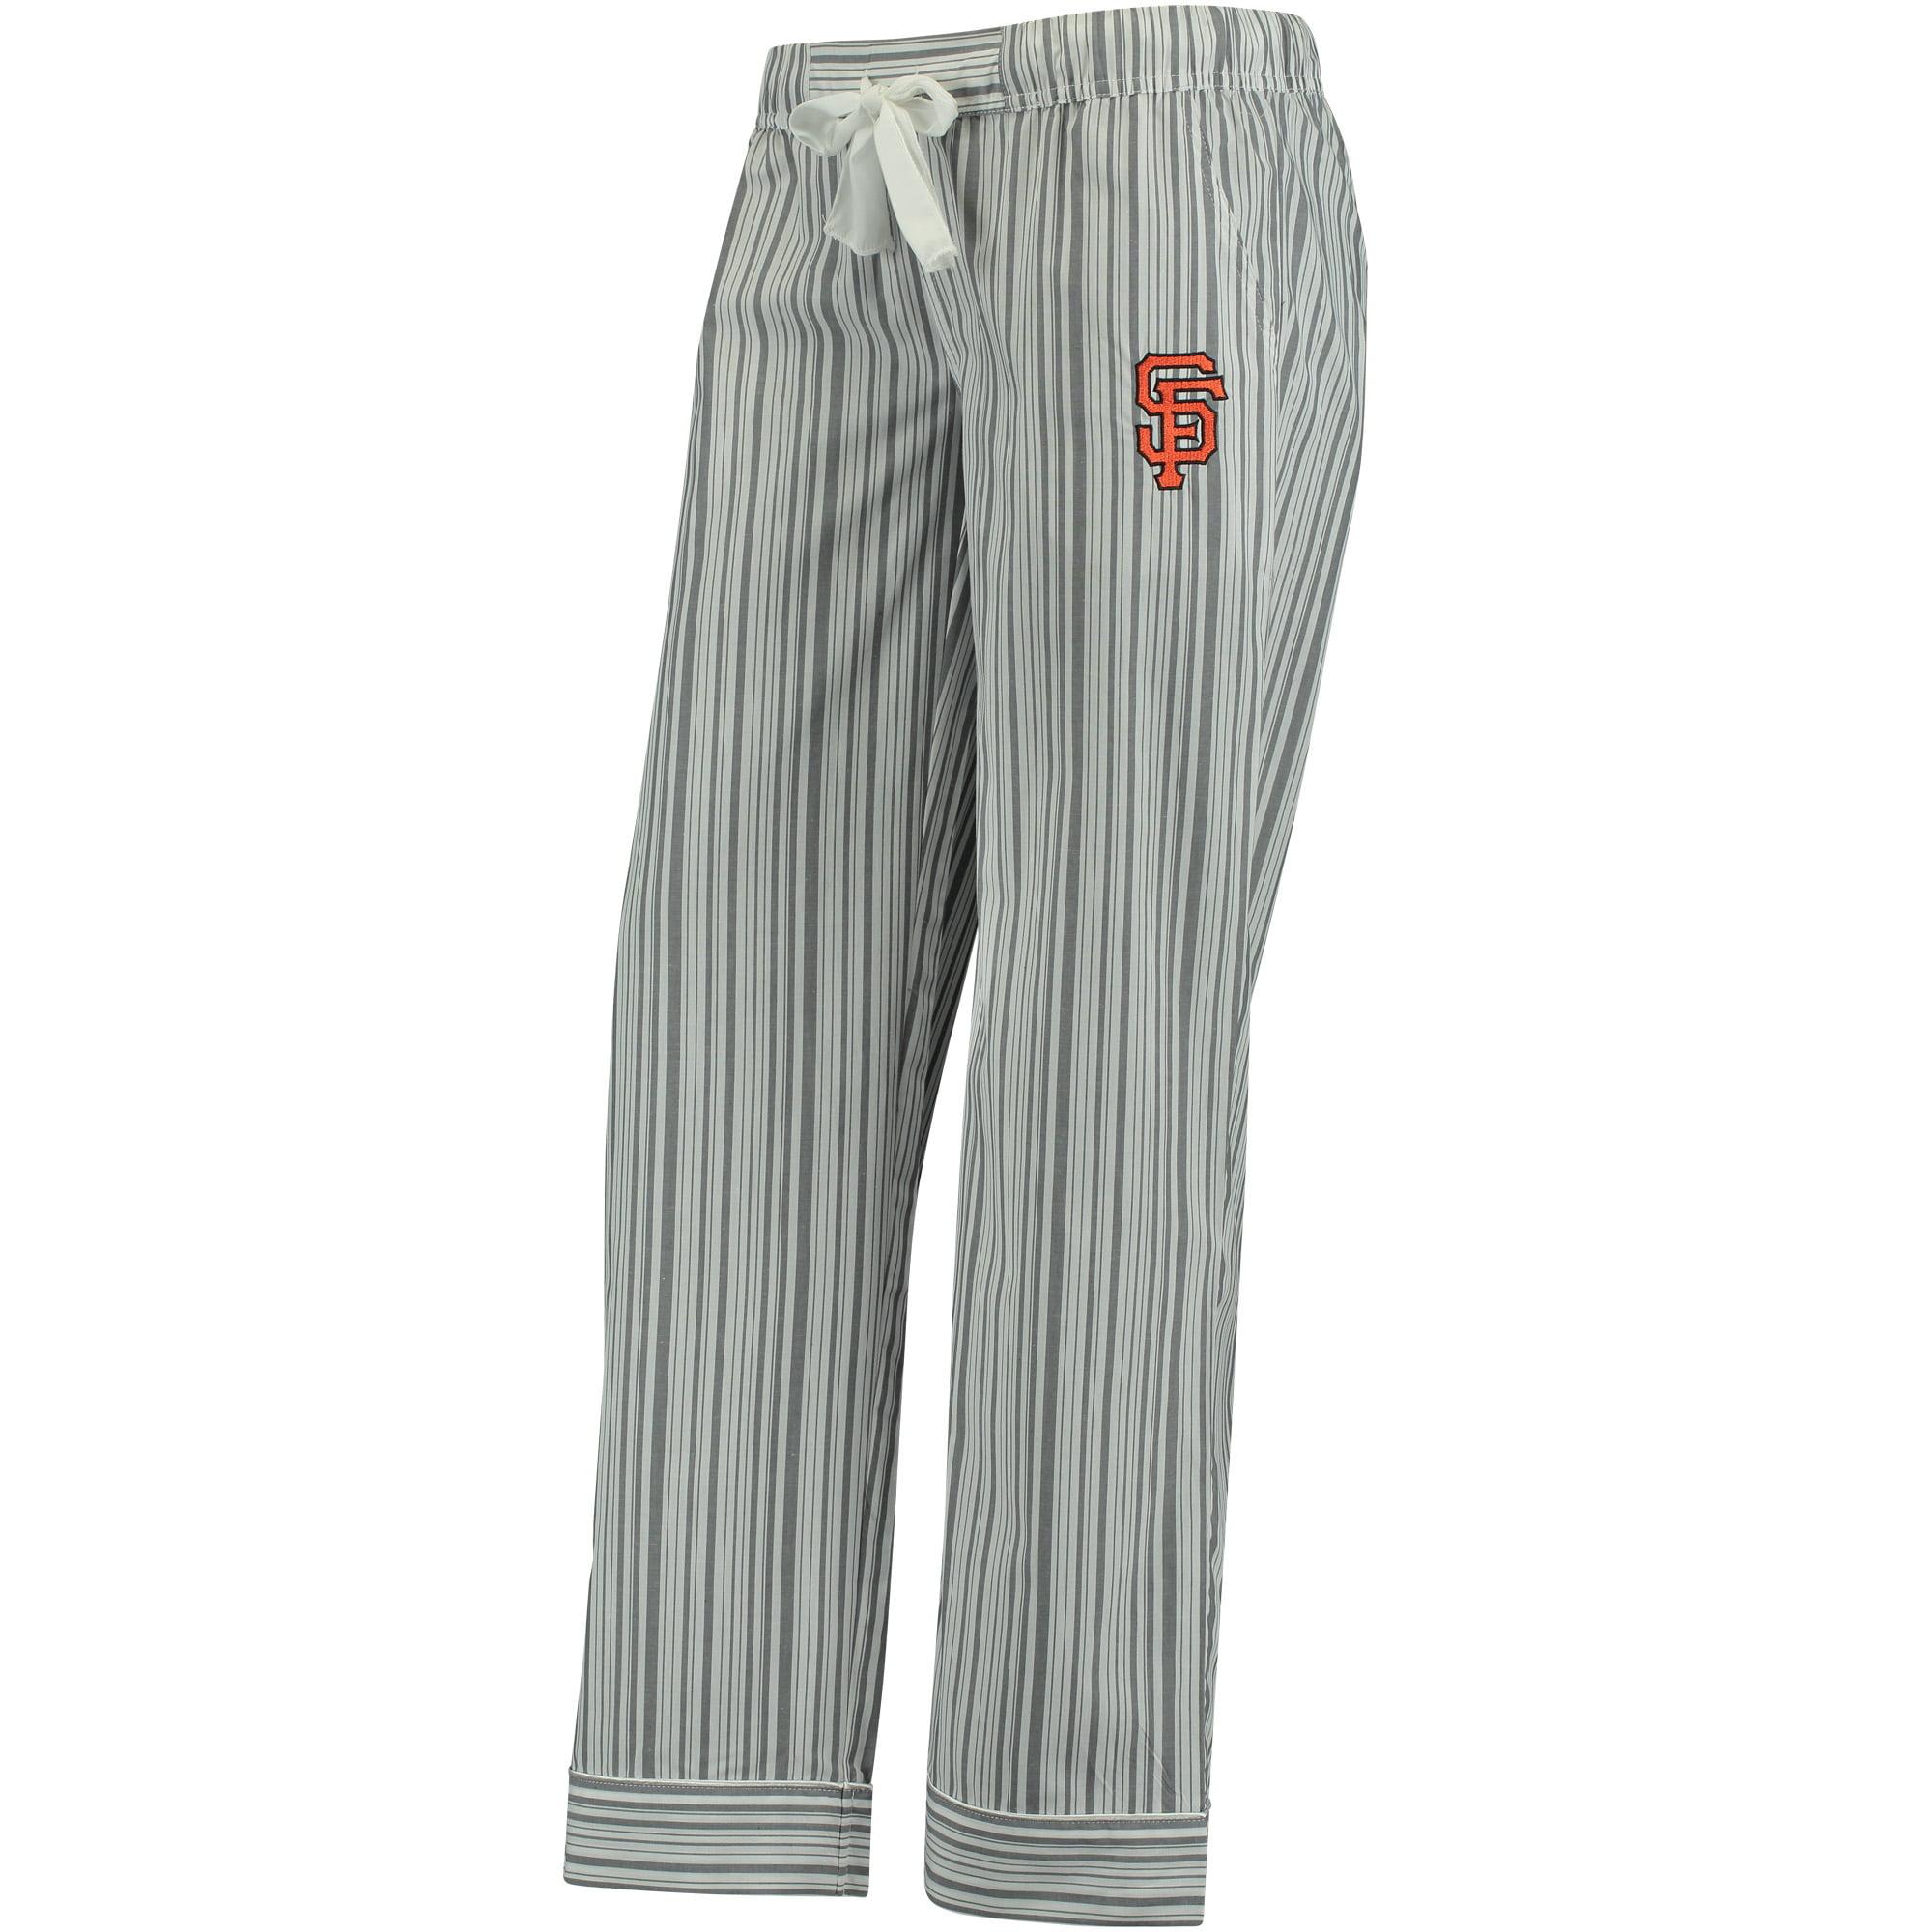 San Francisco Giants Concepts Sport Women's Principle Woven Lounge Pants - Charcoal/White